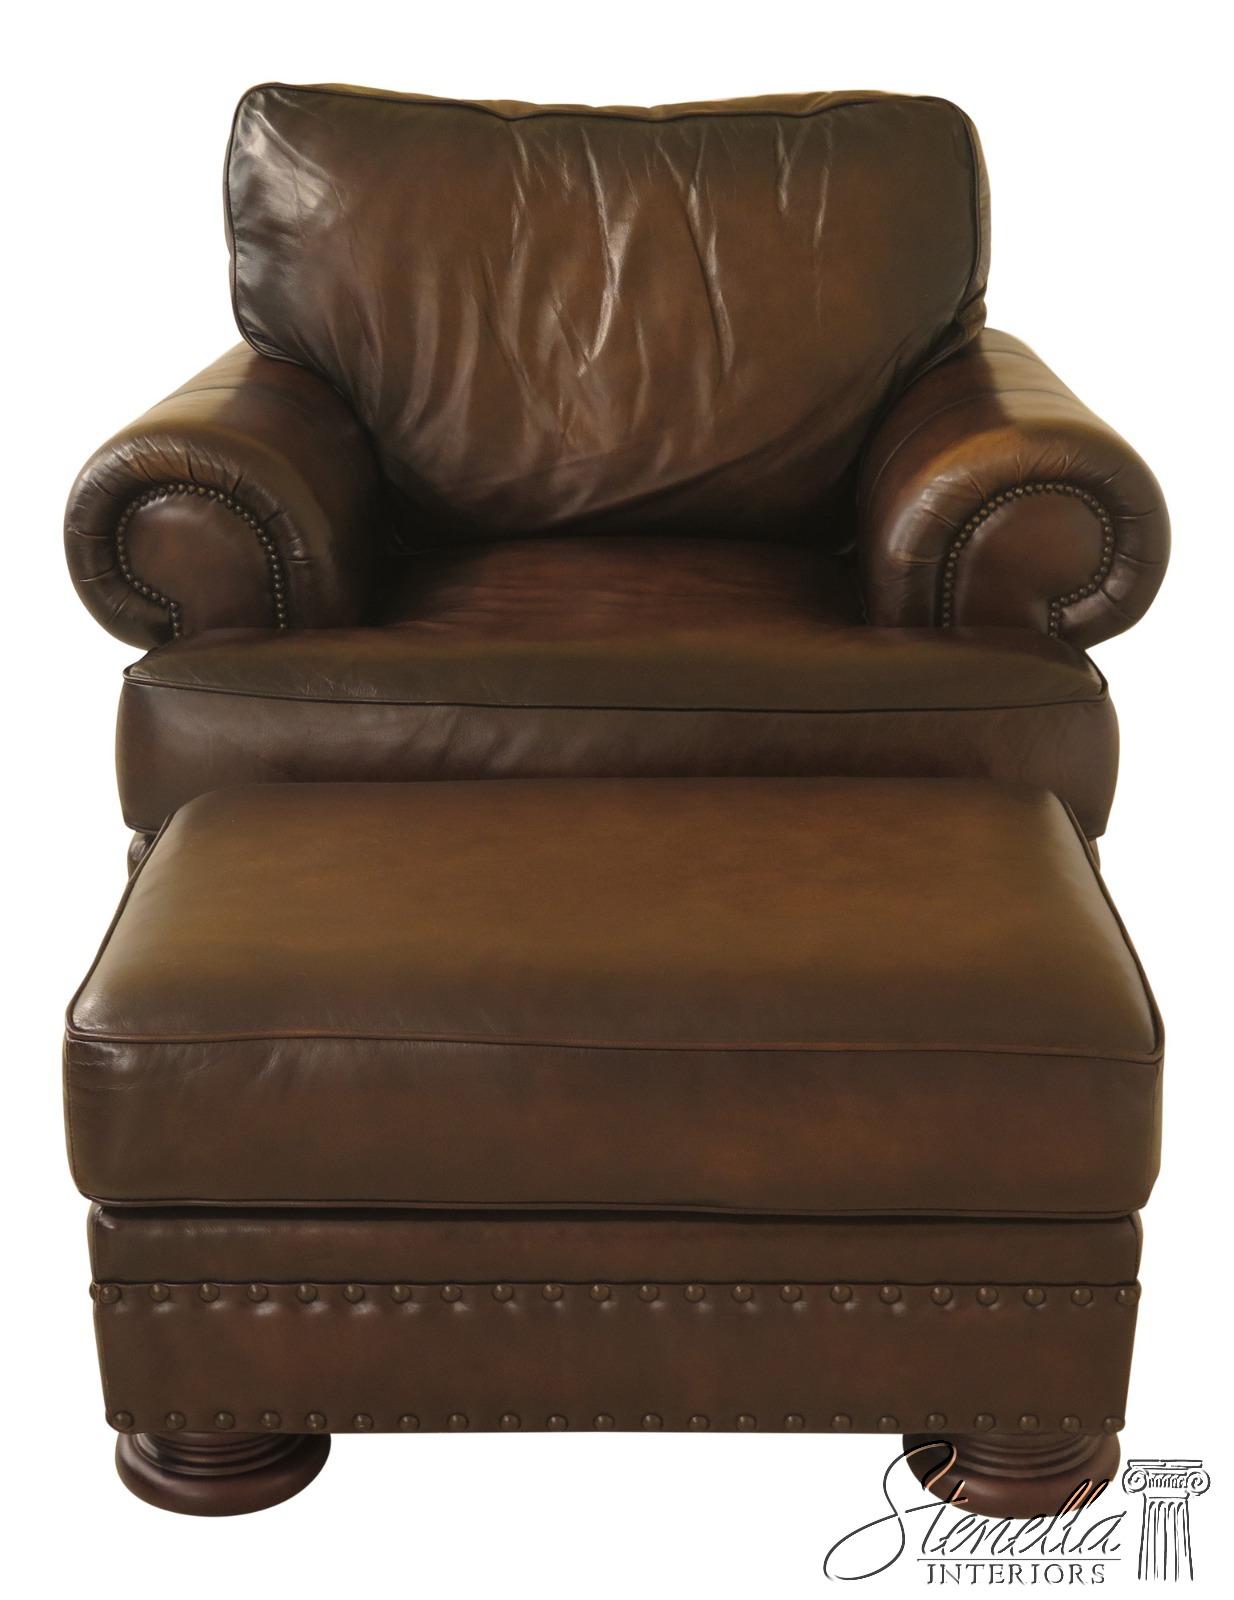 Cool Details About 30782Ec Bernhardt Oversized Leather Club Chair Ottoman Alphanode Cool Chair Designs And Ideas Alphanodeonline